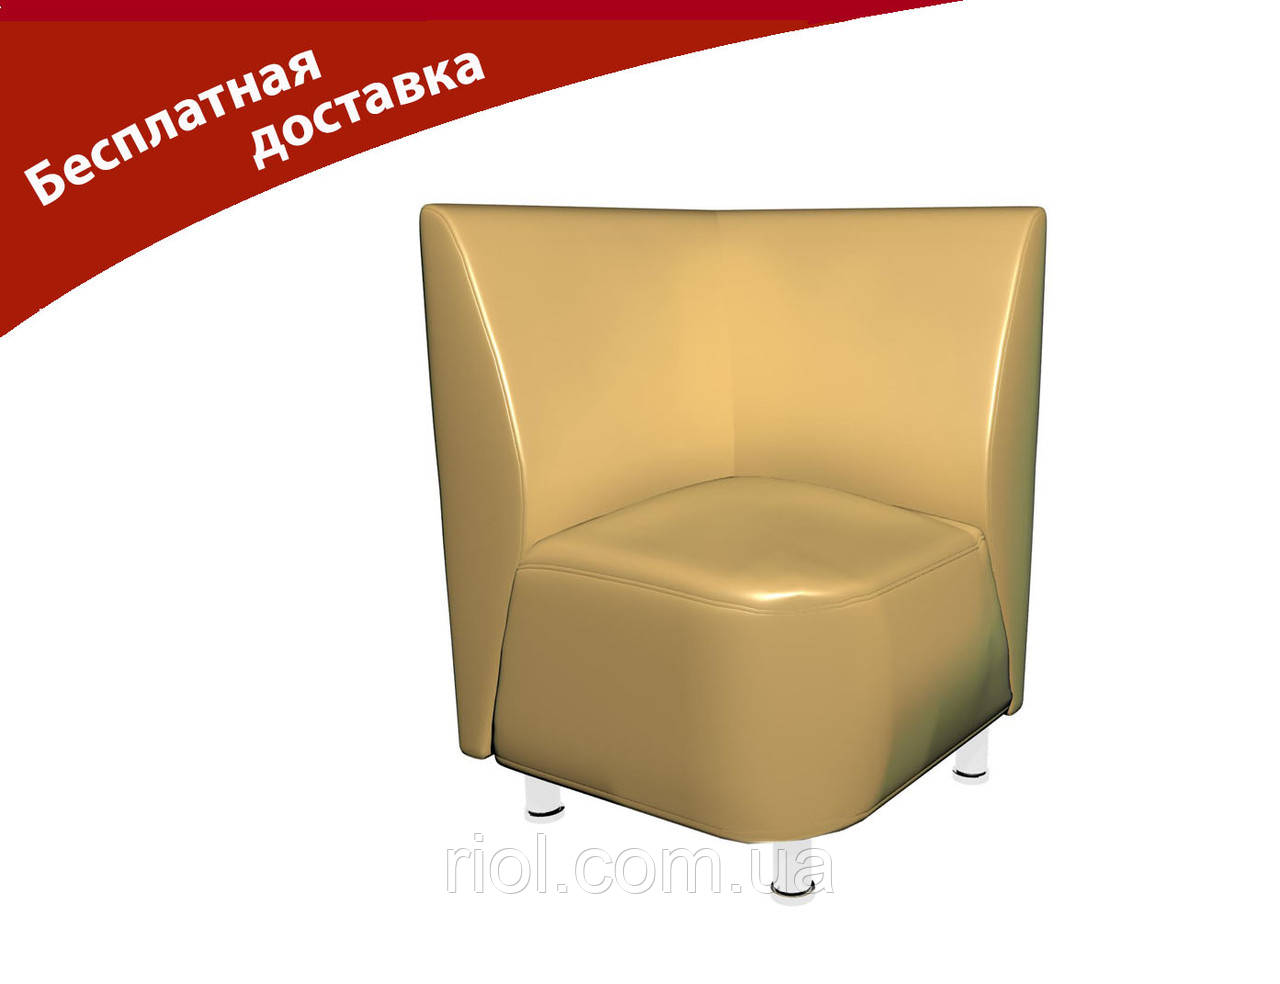 Кресло-угол бежевый